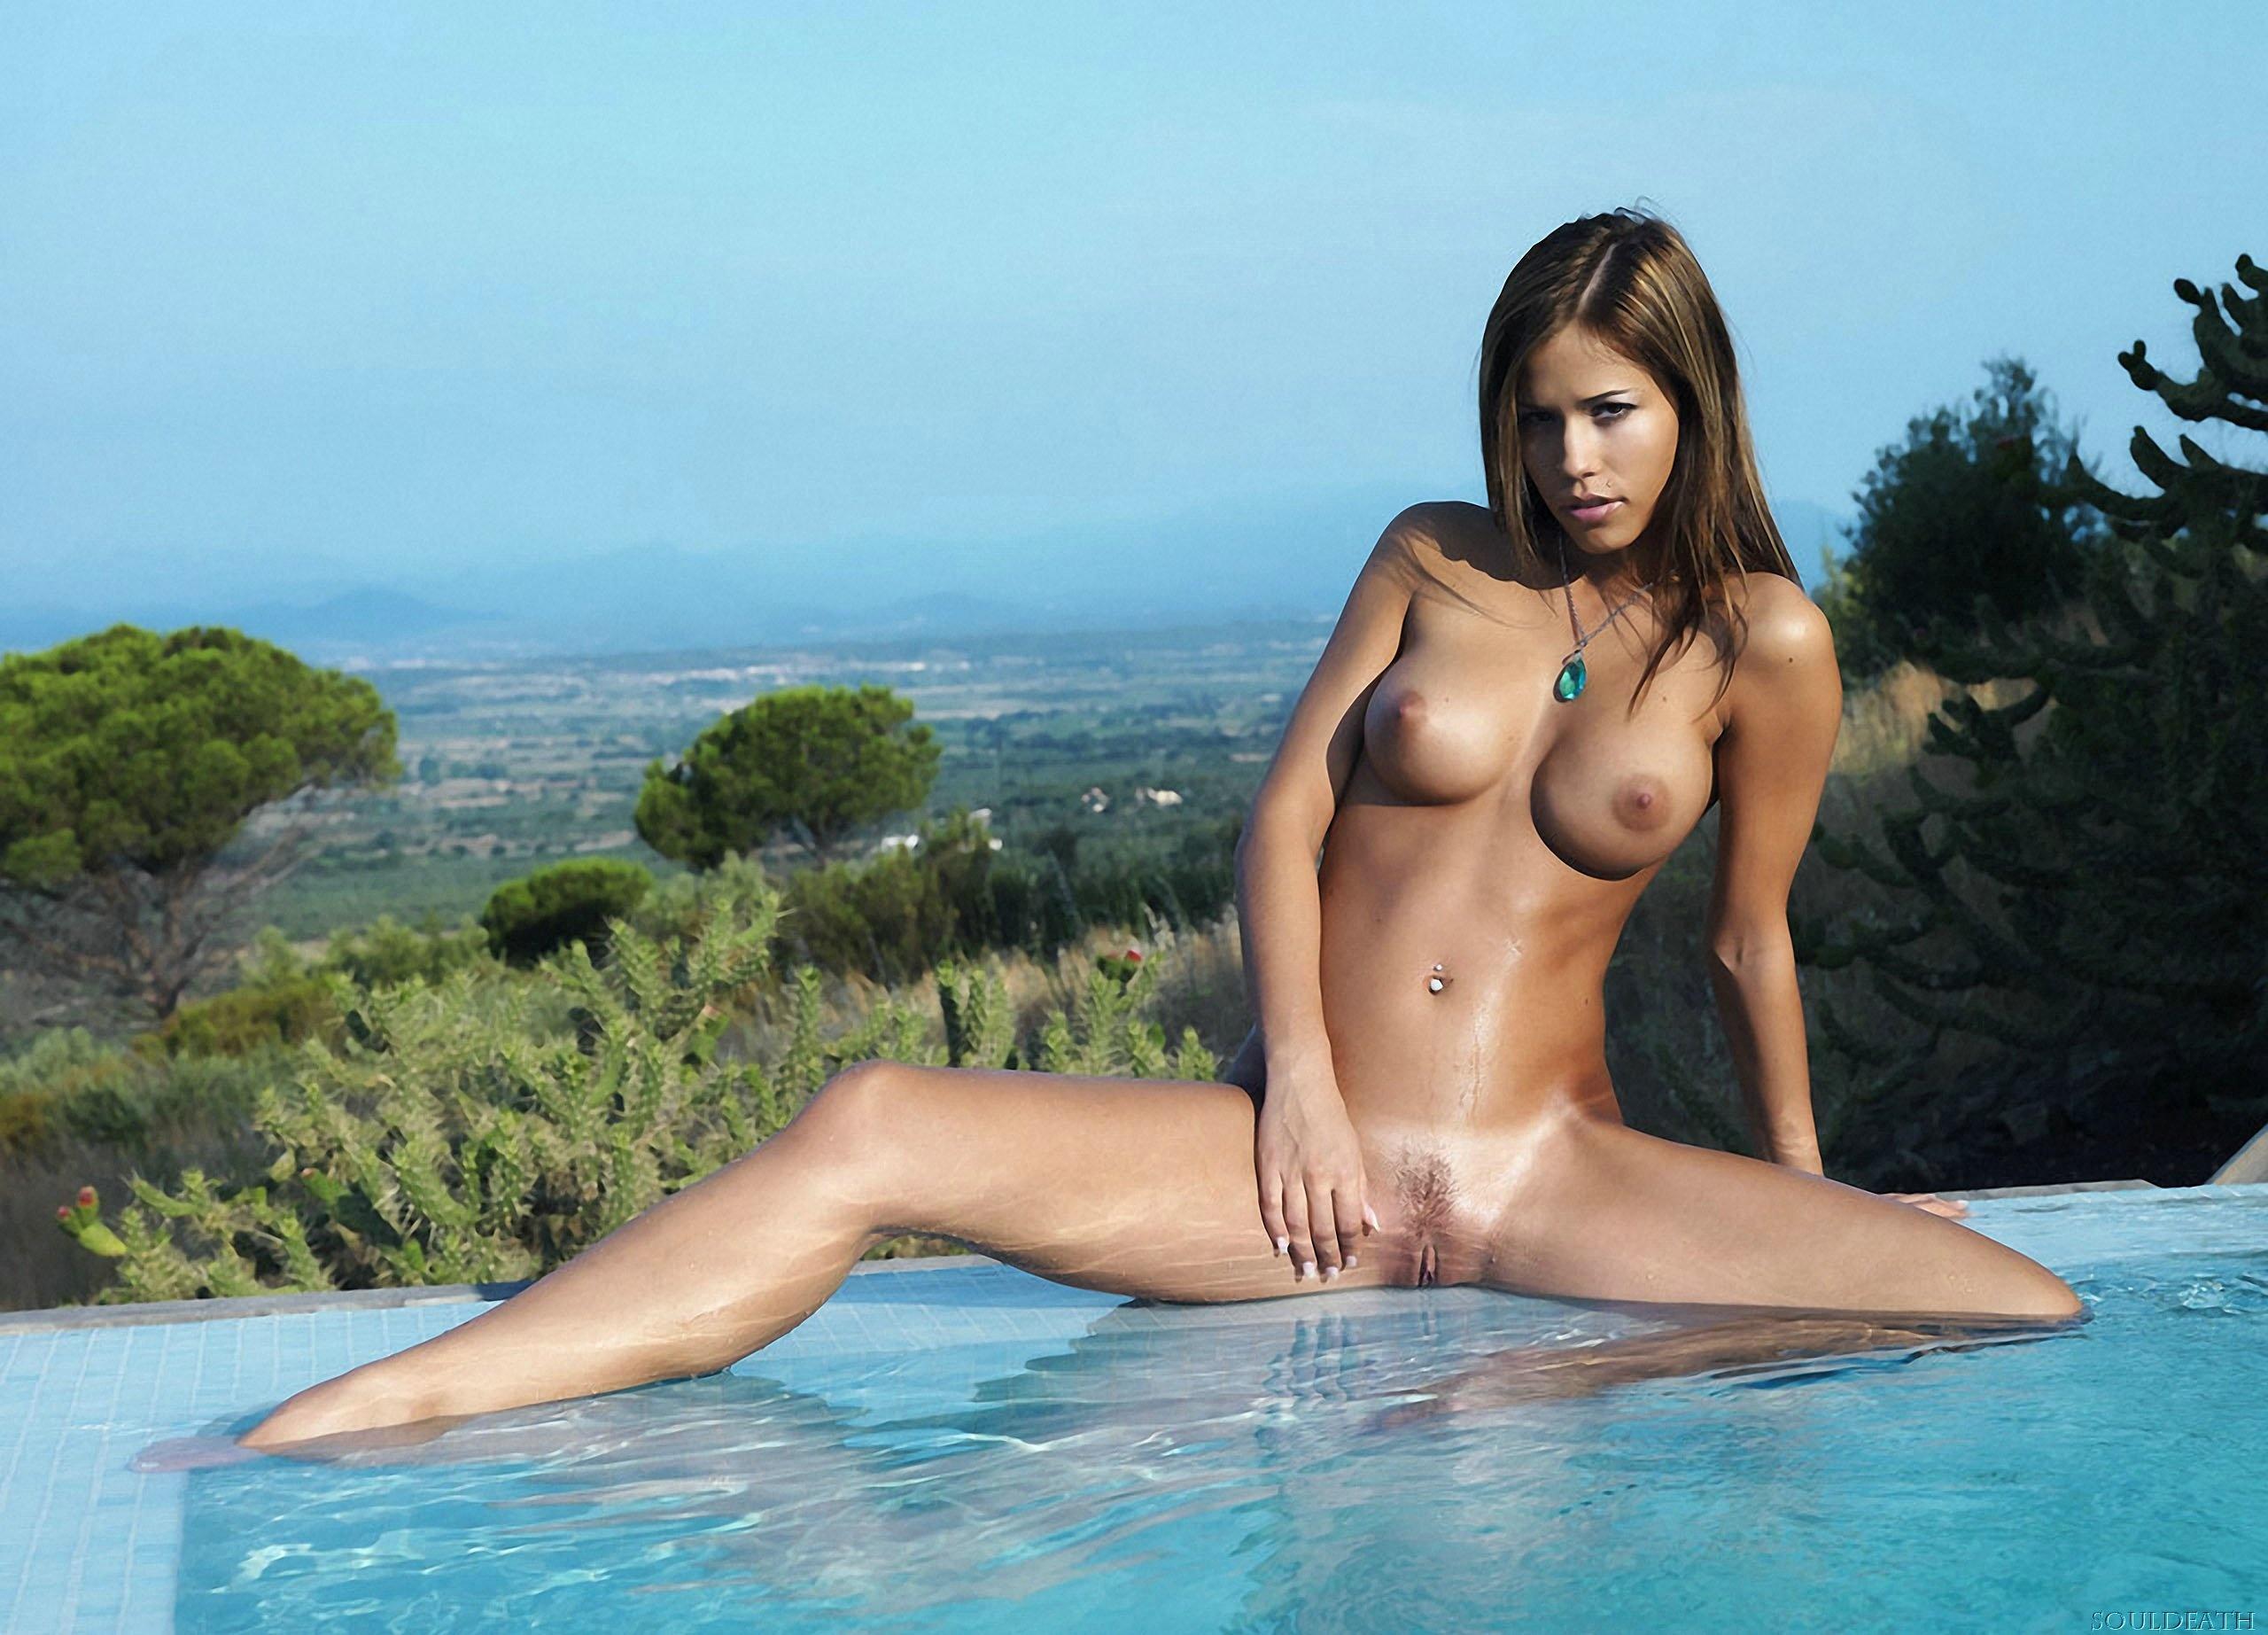 Will Natrally tan girls naked Unfortunately!